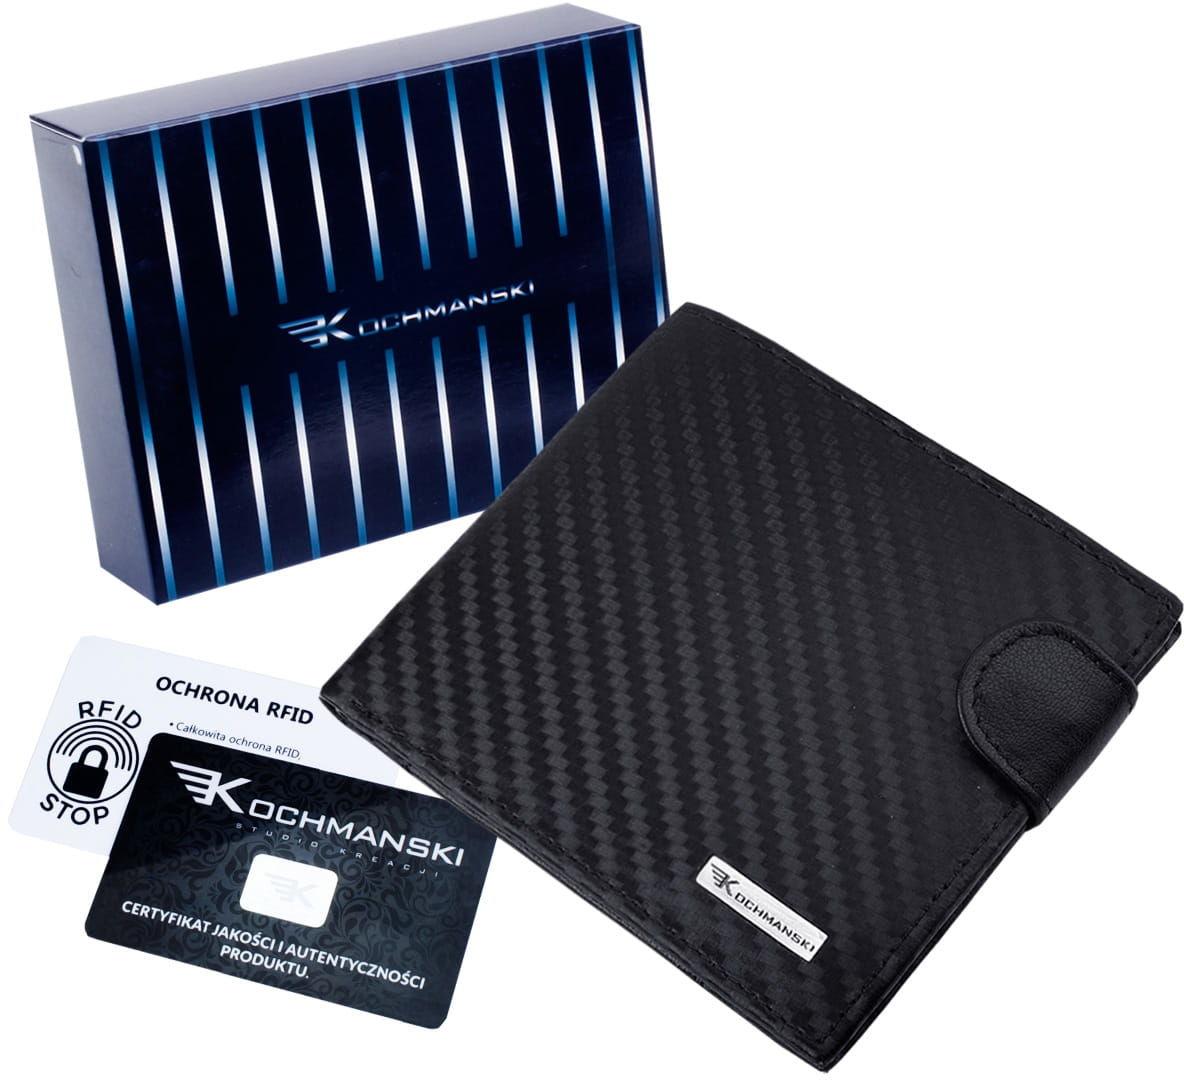 KOCHMANSKI cienki skórzany portfel męski PREMIUM 3209